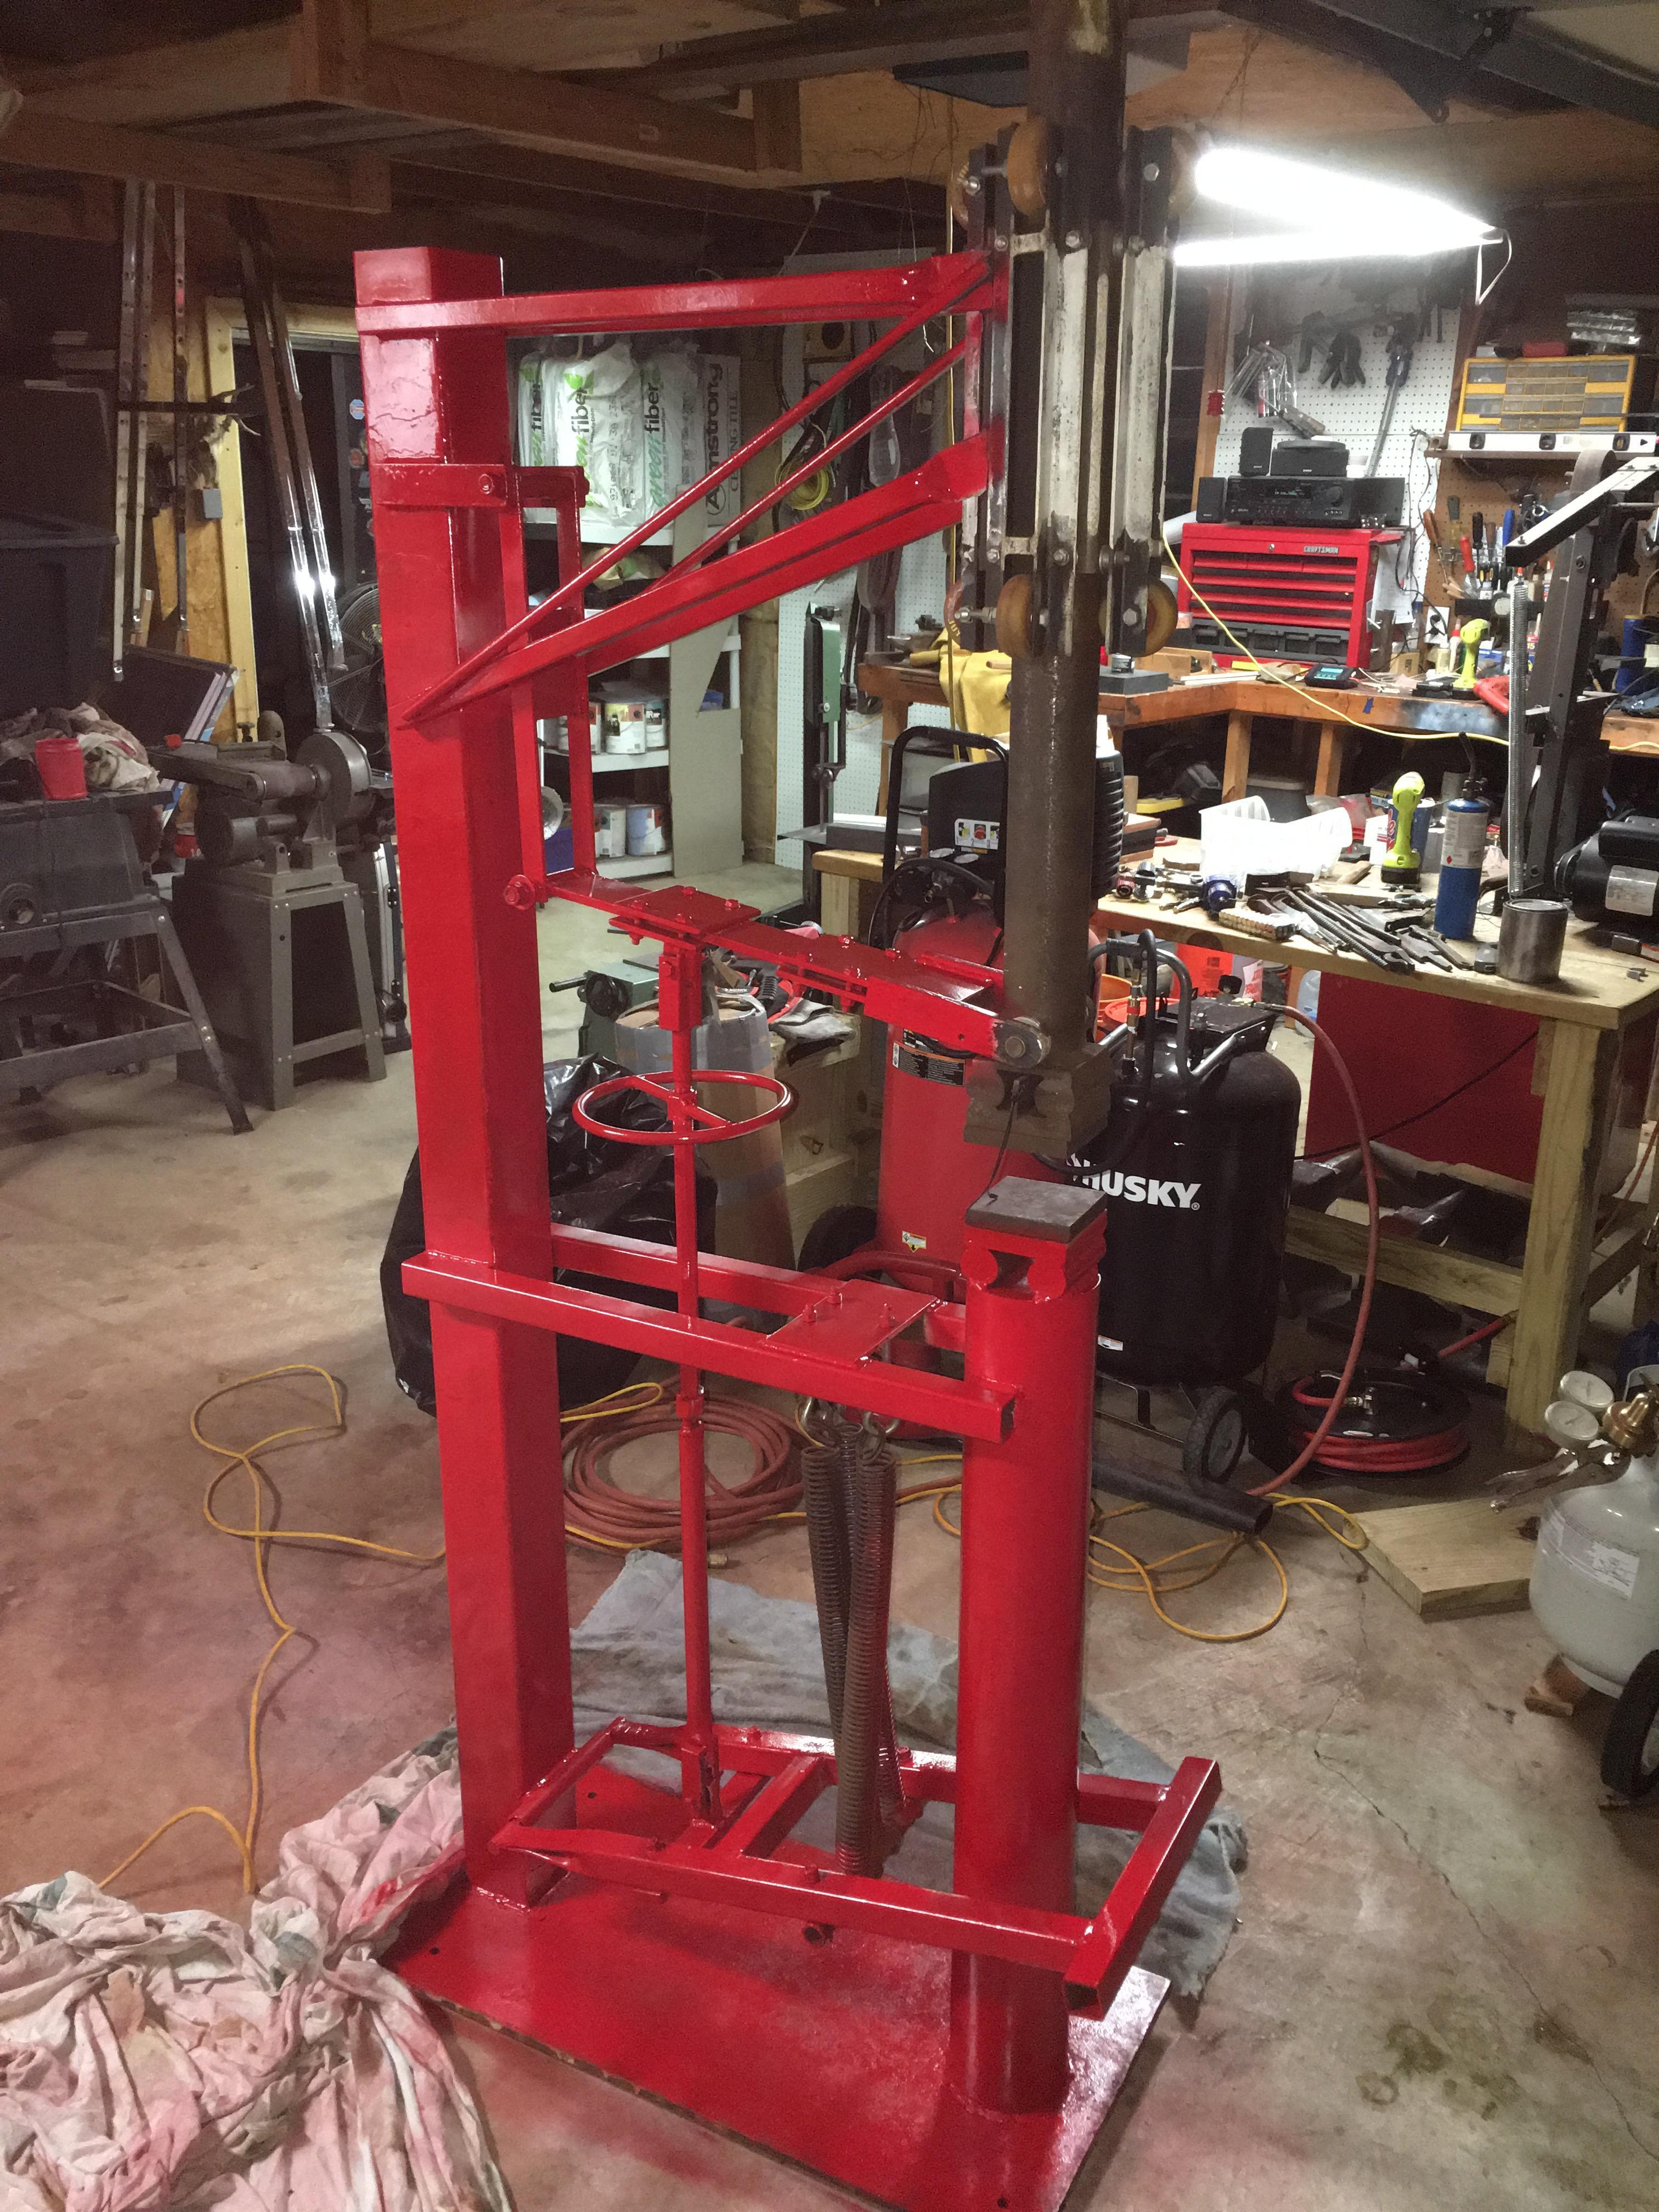 Treadle hammer kit